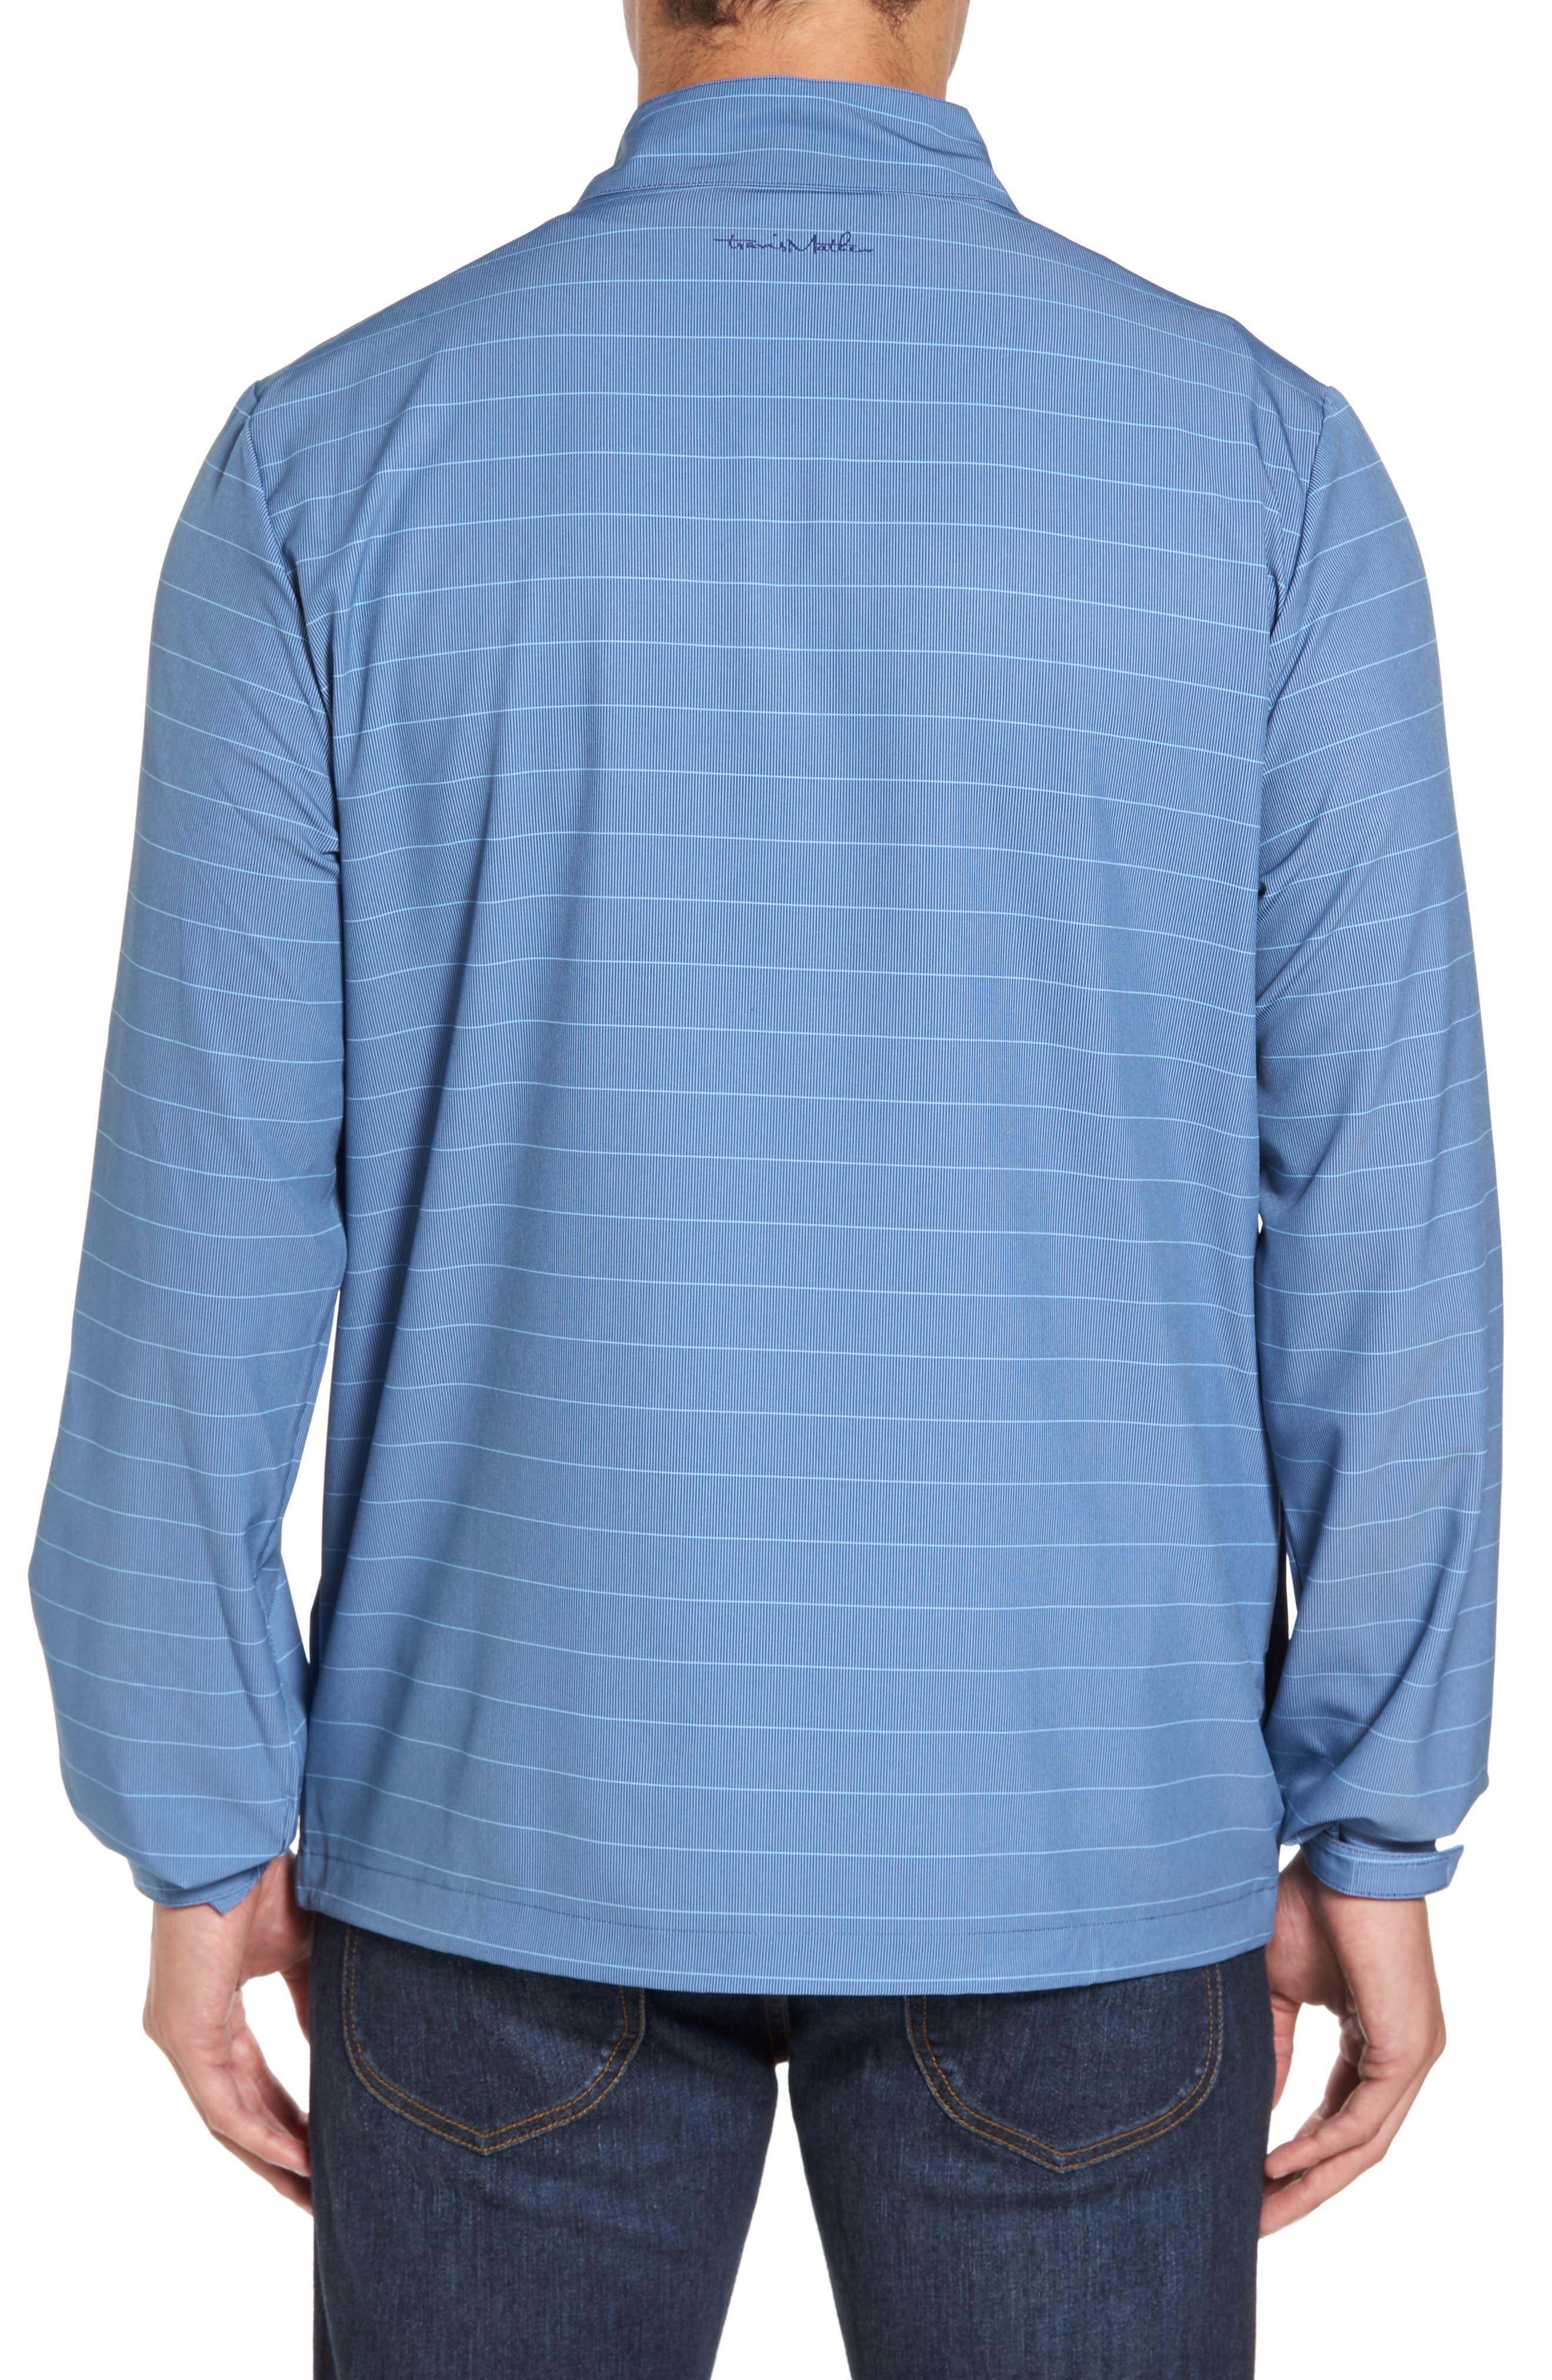 Dubes Quarter Zip Pullover Jacket,                             Alternate thumbnail 2, color,                             Blue Indigo